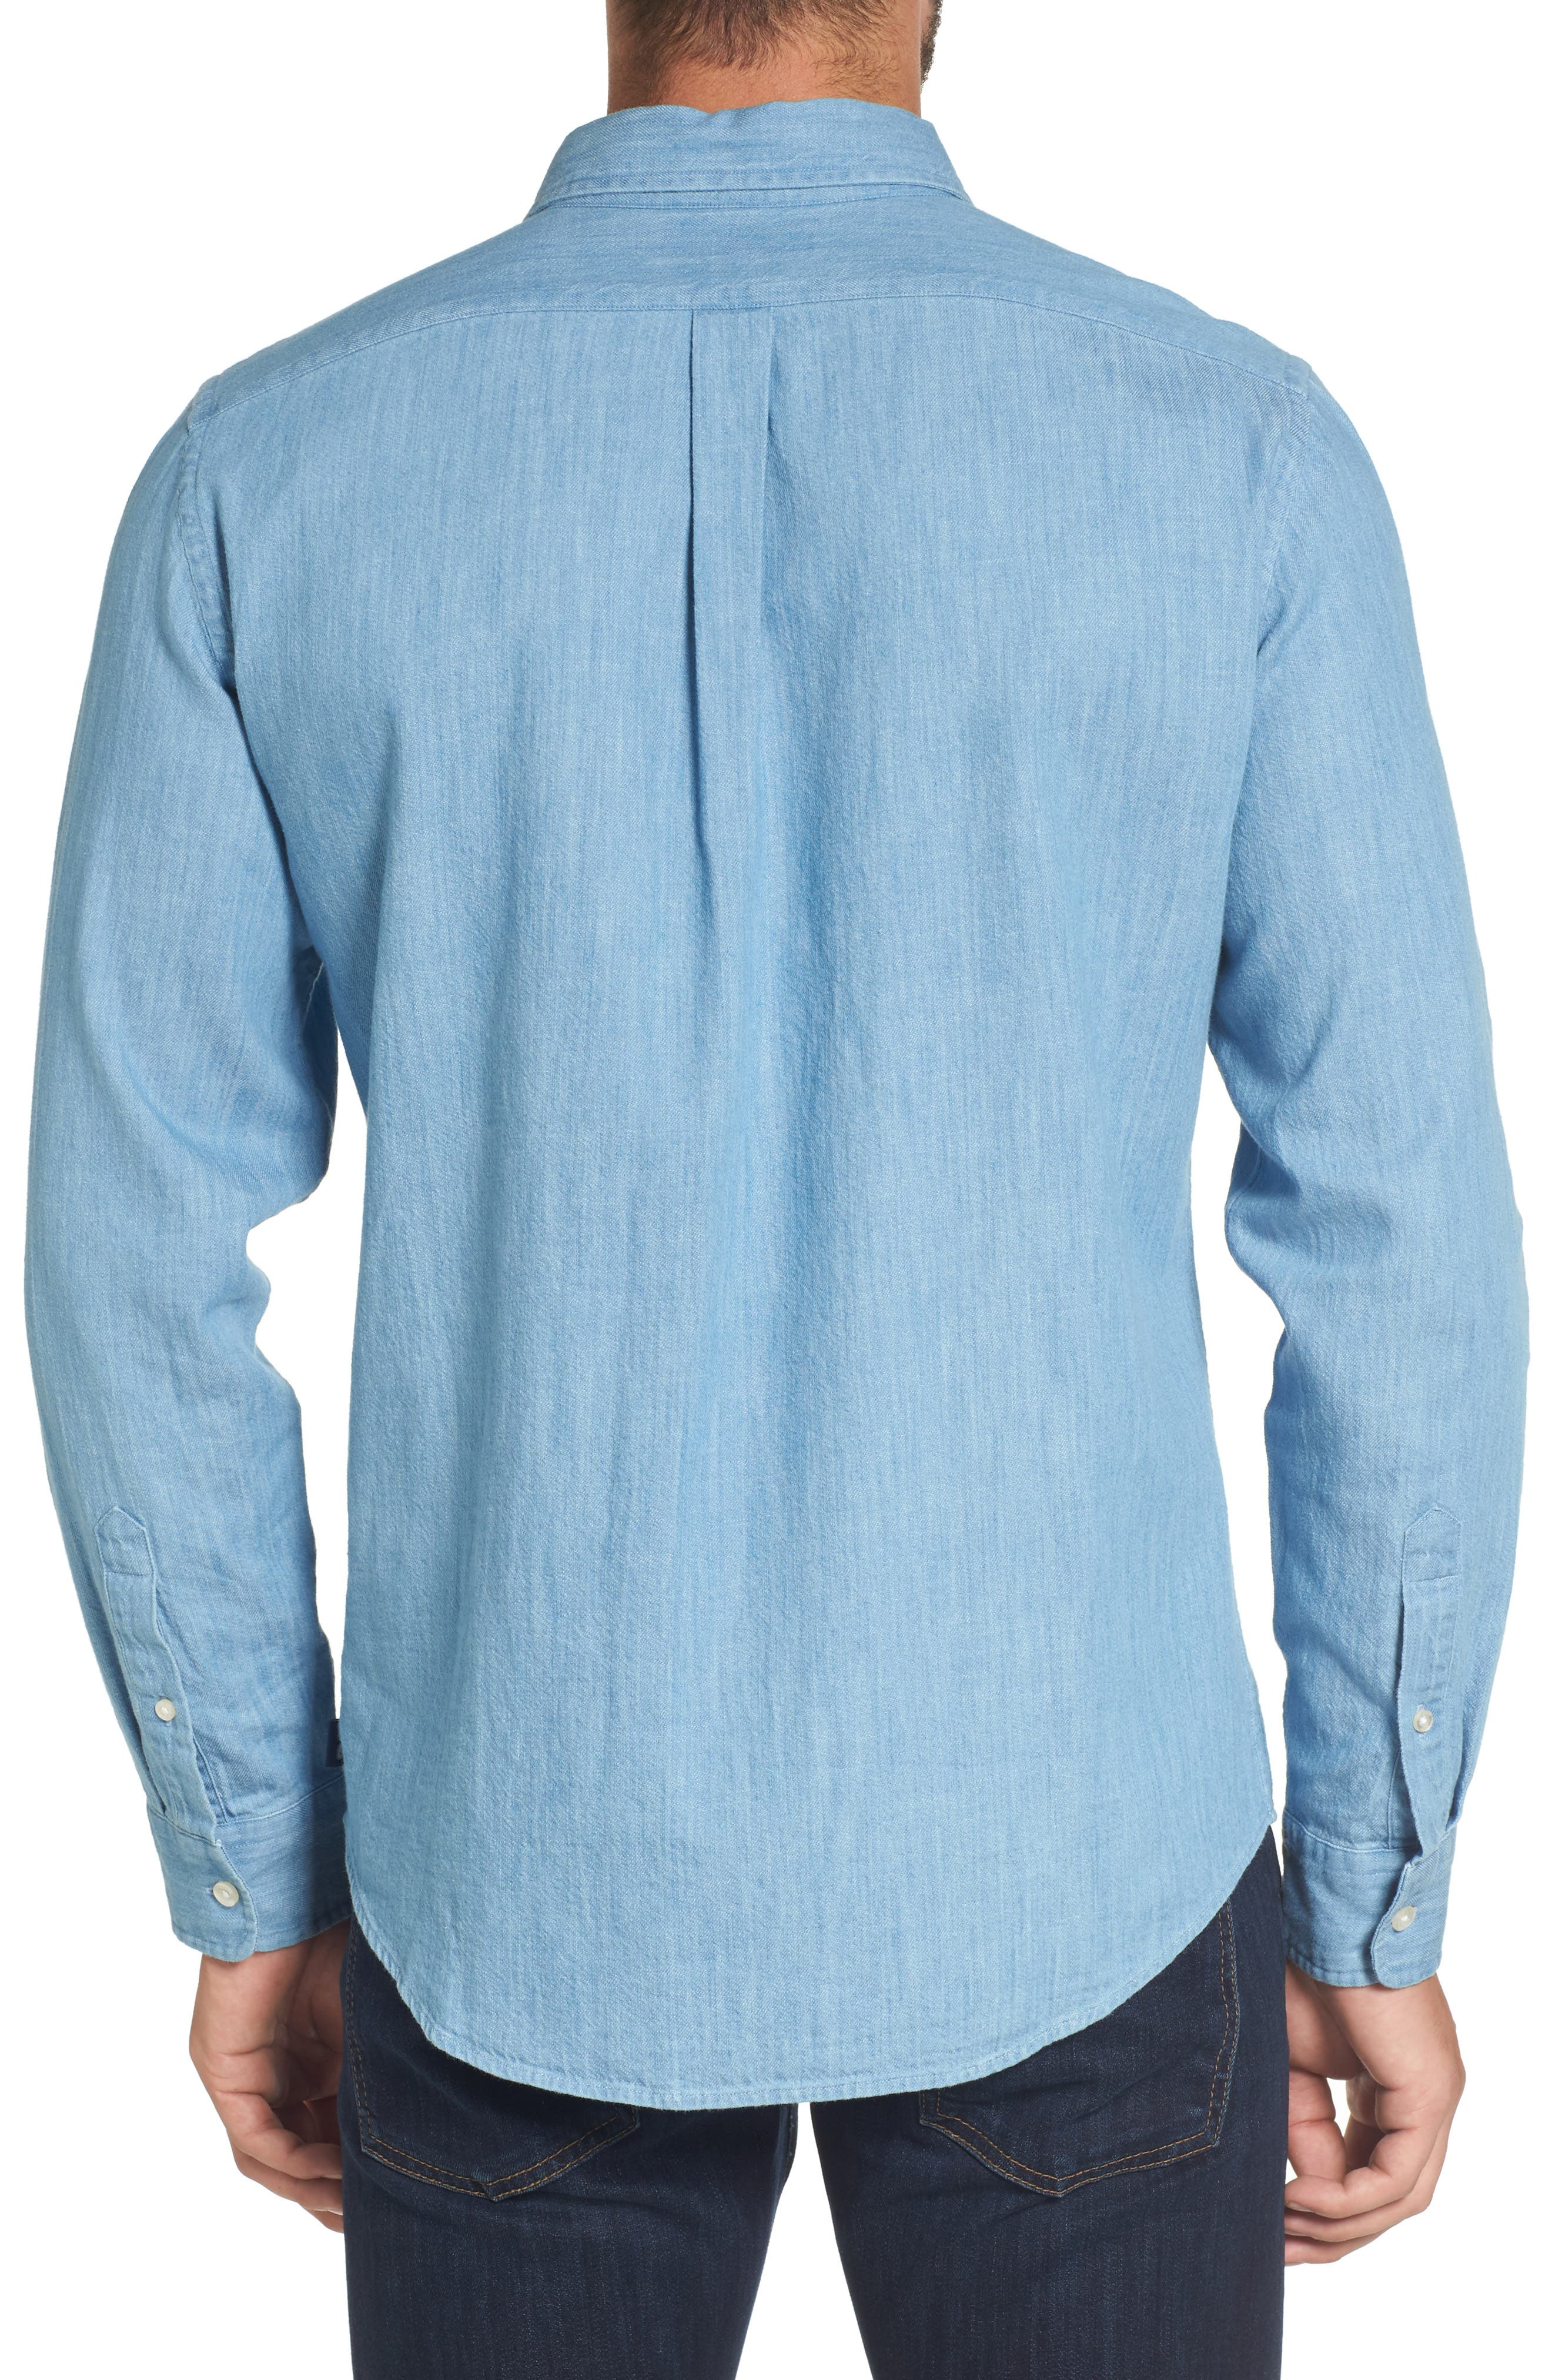 Lightkeeper Slim Fit Chambray Sport Shirt,                             Alternate thumbnail 2, color,                             429